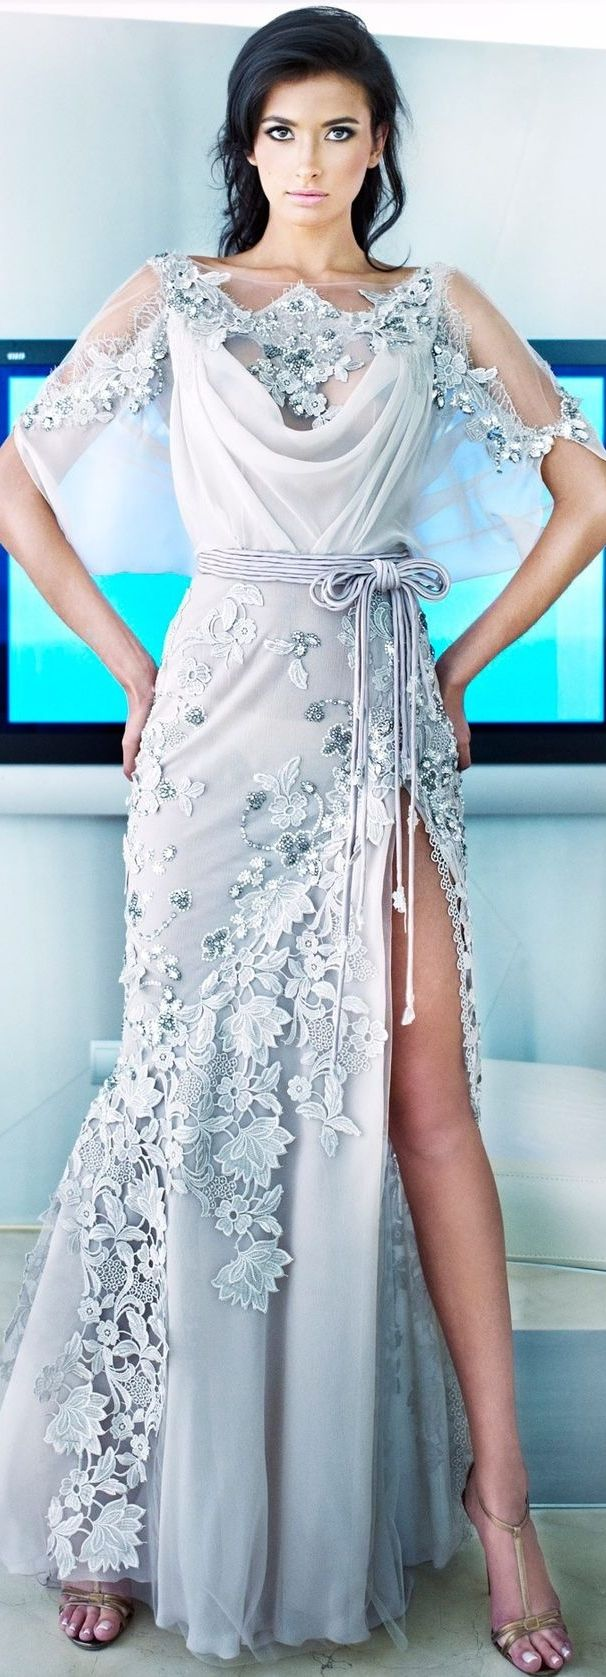 Ziad Nakad♥✤ | KeepSmiling | BeStayClassy | White lace dress with side slit